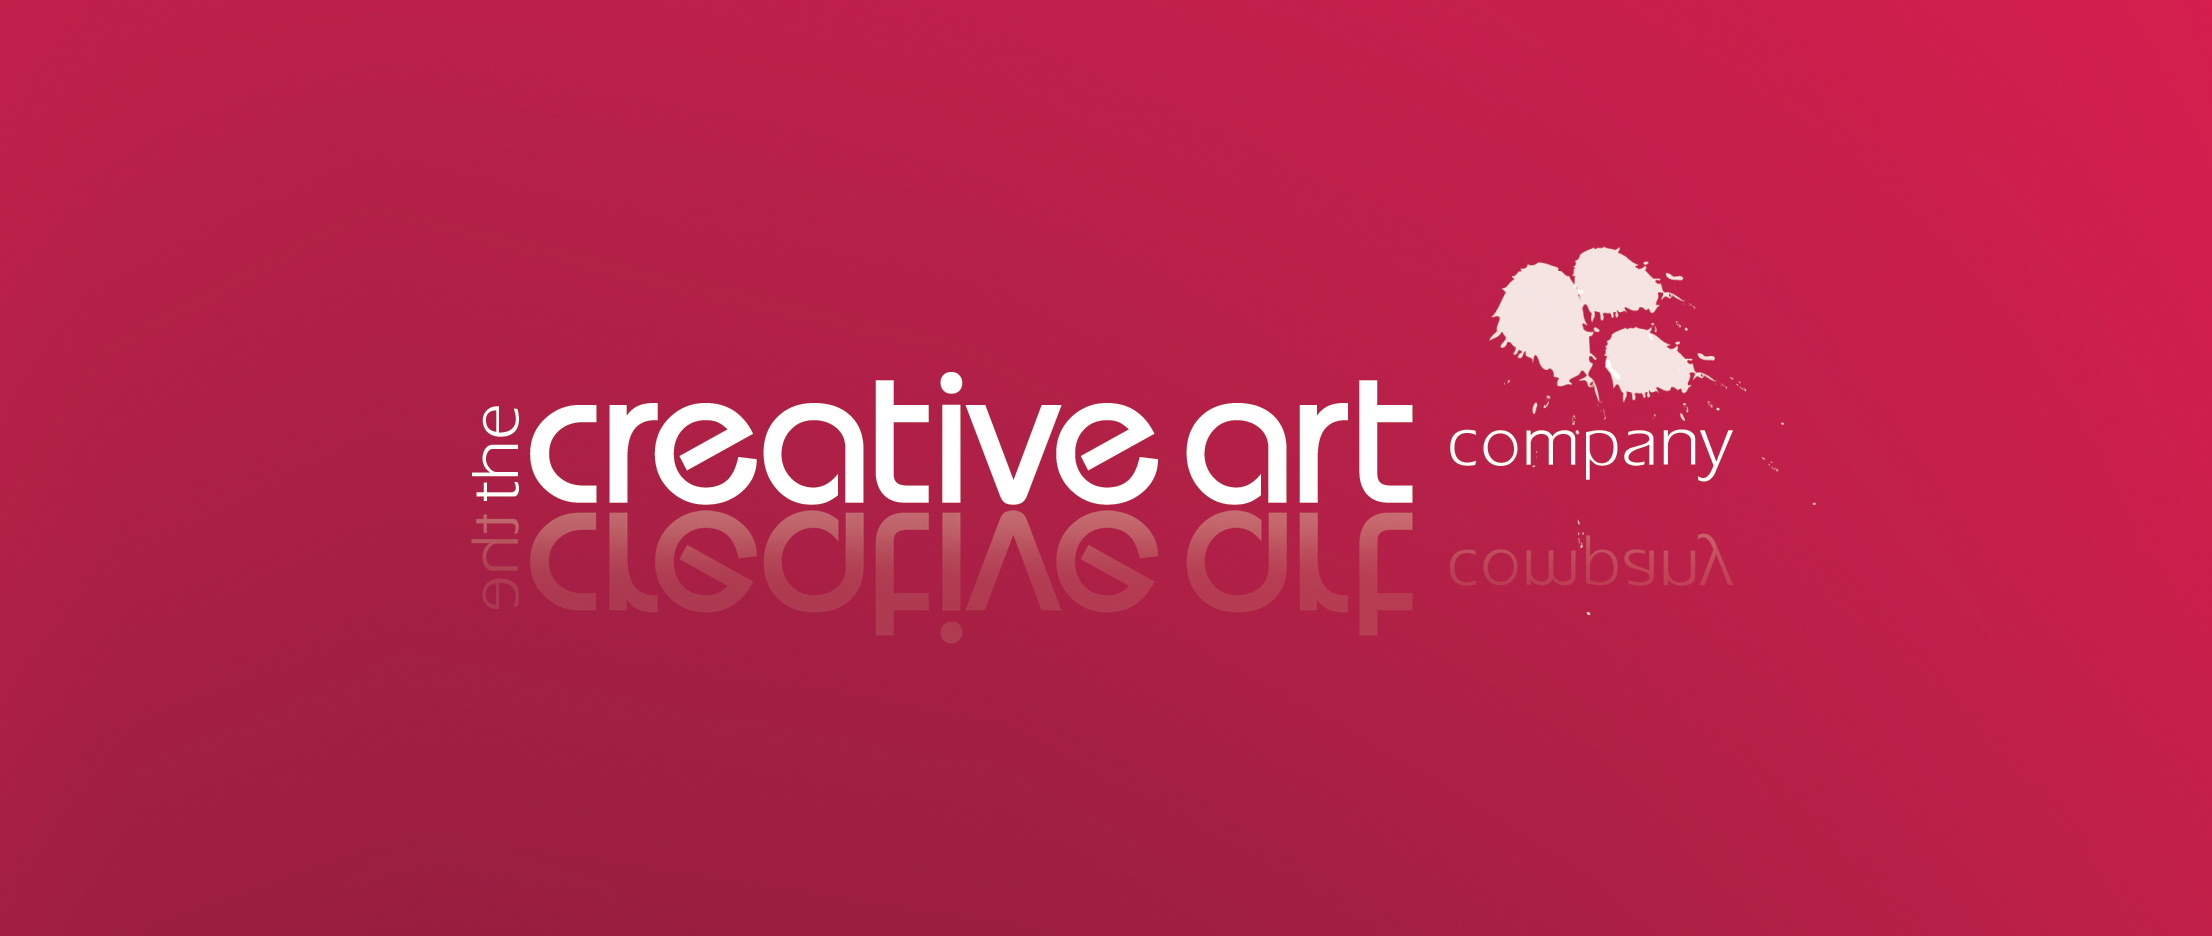 file the creative art company logo 5 jpg wikimedia commons